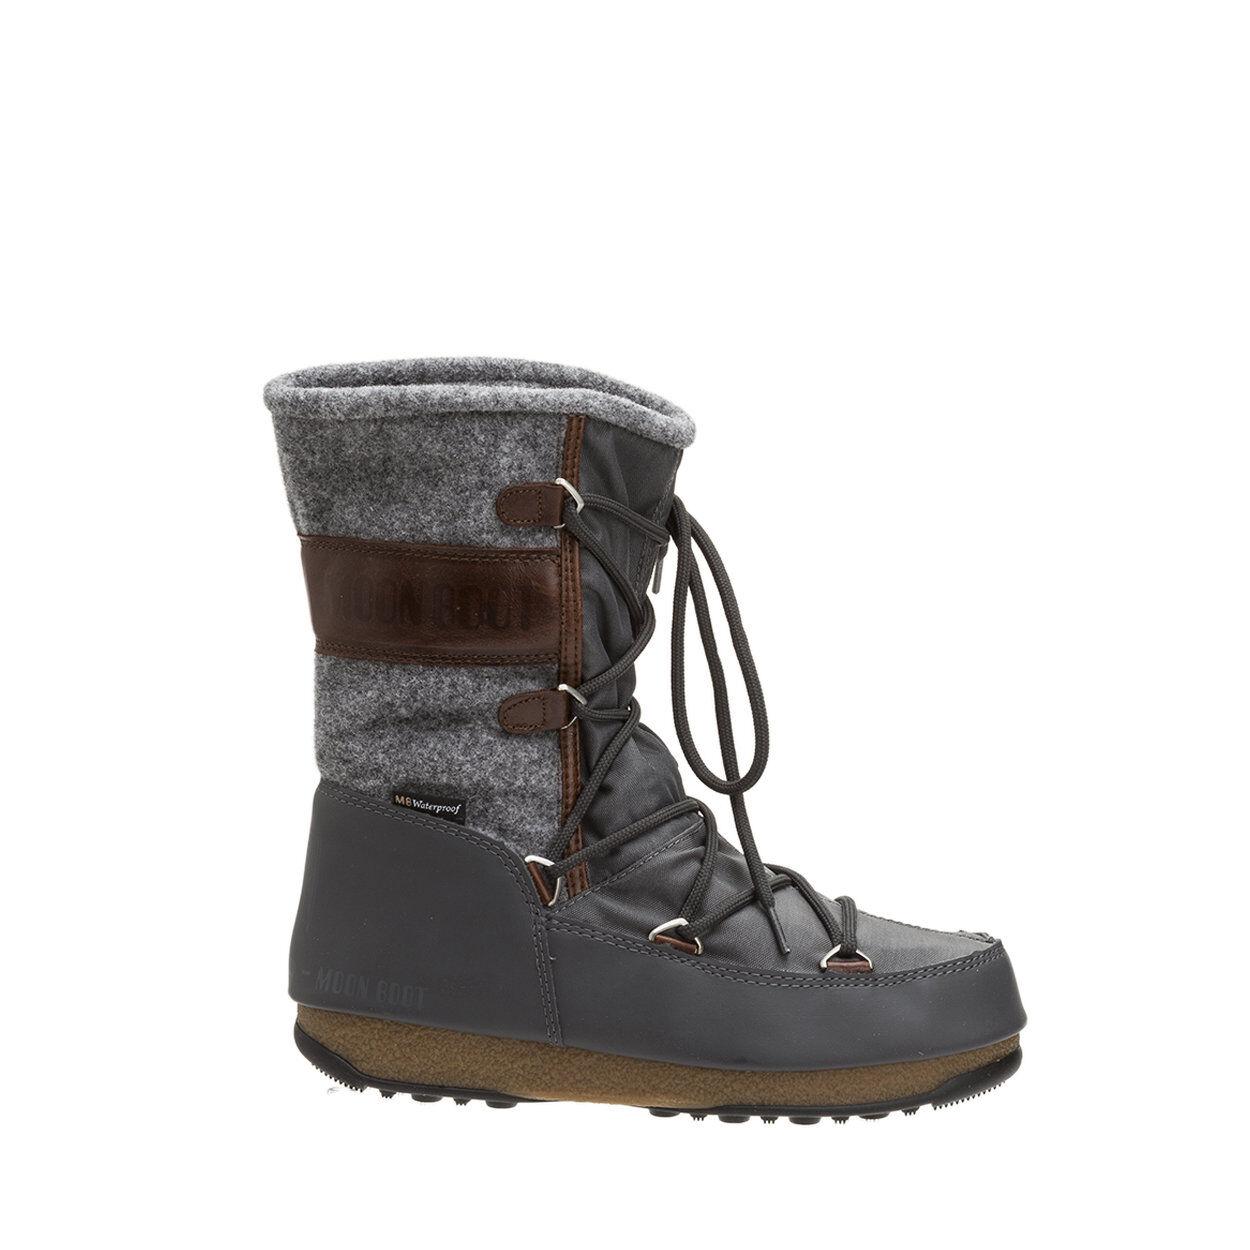 Moon Boot Stivali Vienna felt in nylon e feltro grigio